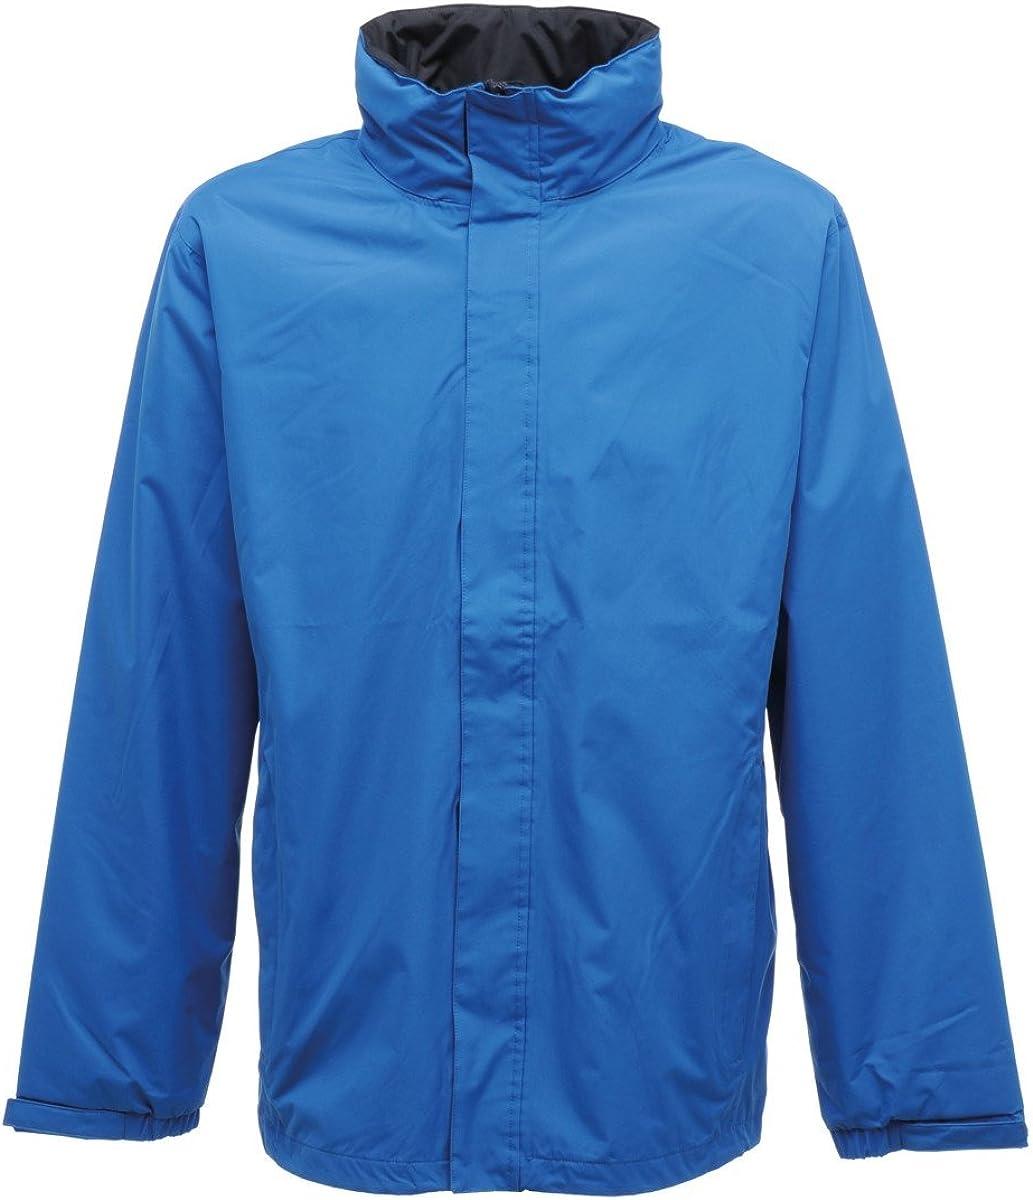 Regatta Mens Standout Ardmore Jacket (Waterproof & Windproof) (S) (Oxford Blue/Seal Grey)